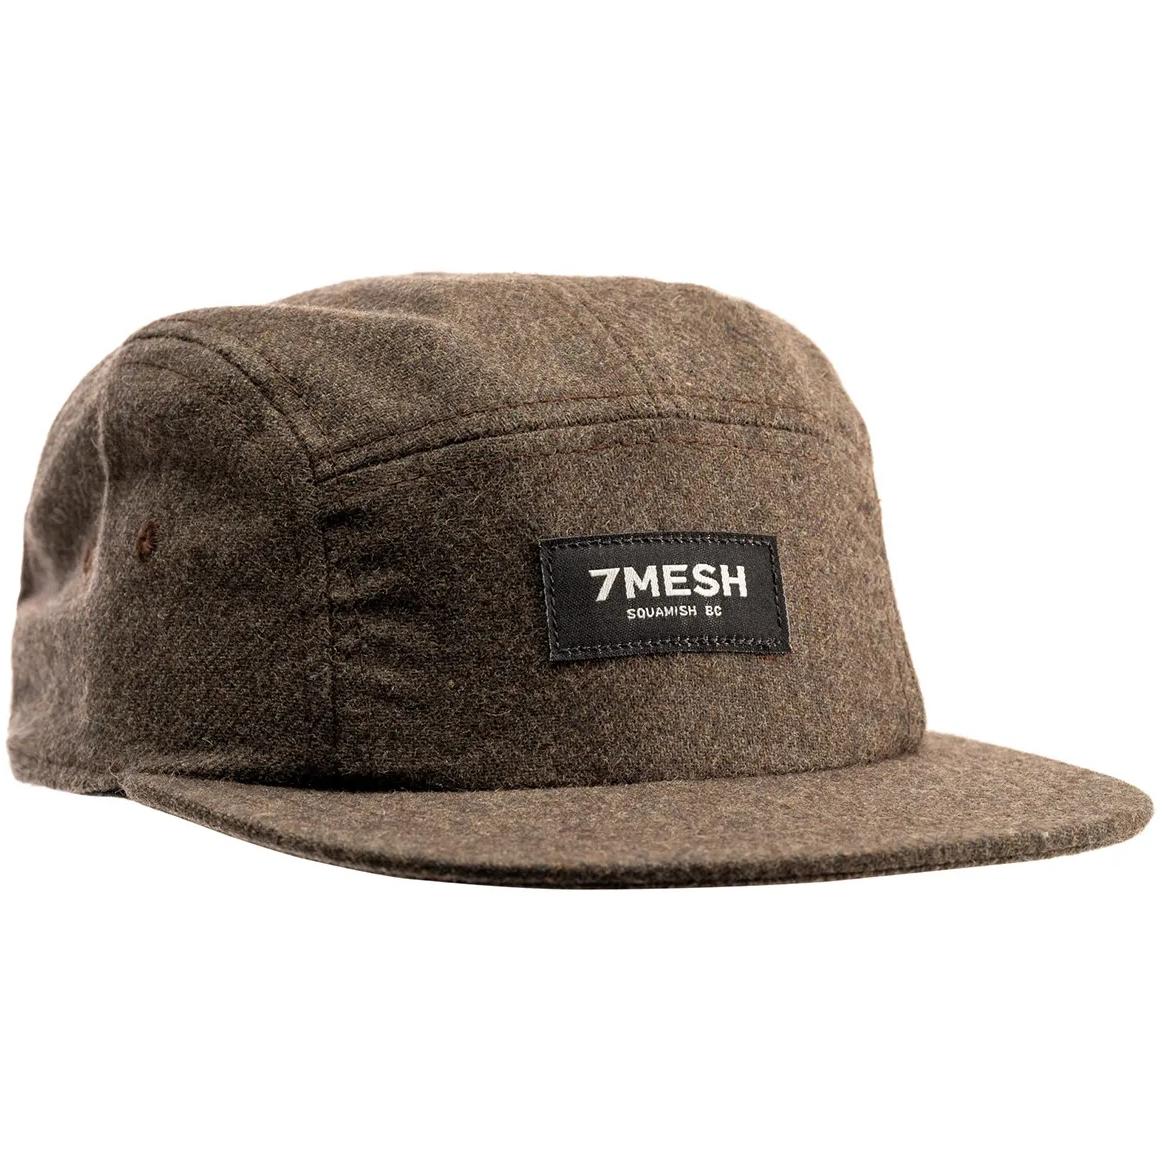 7mesh Trailside Flannel Gorra - Dark Moss